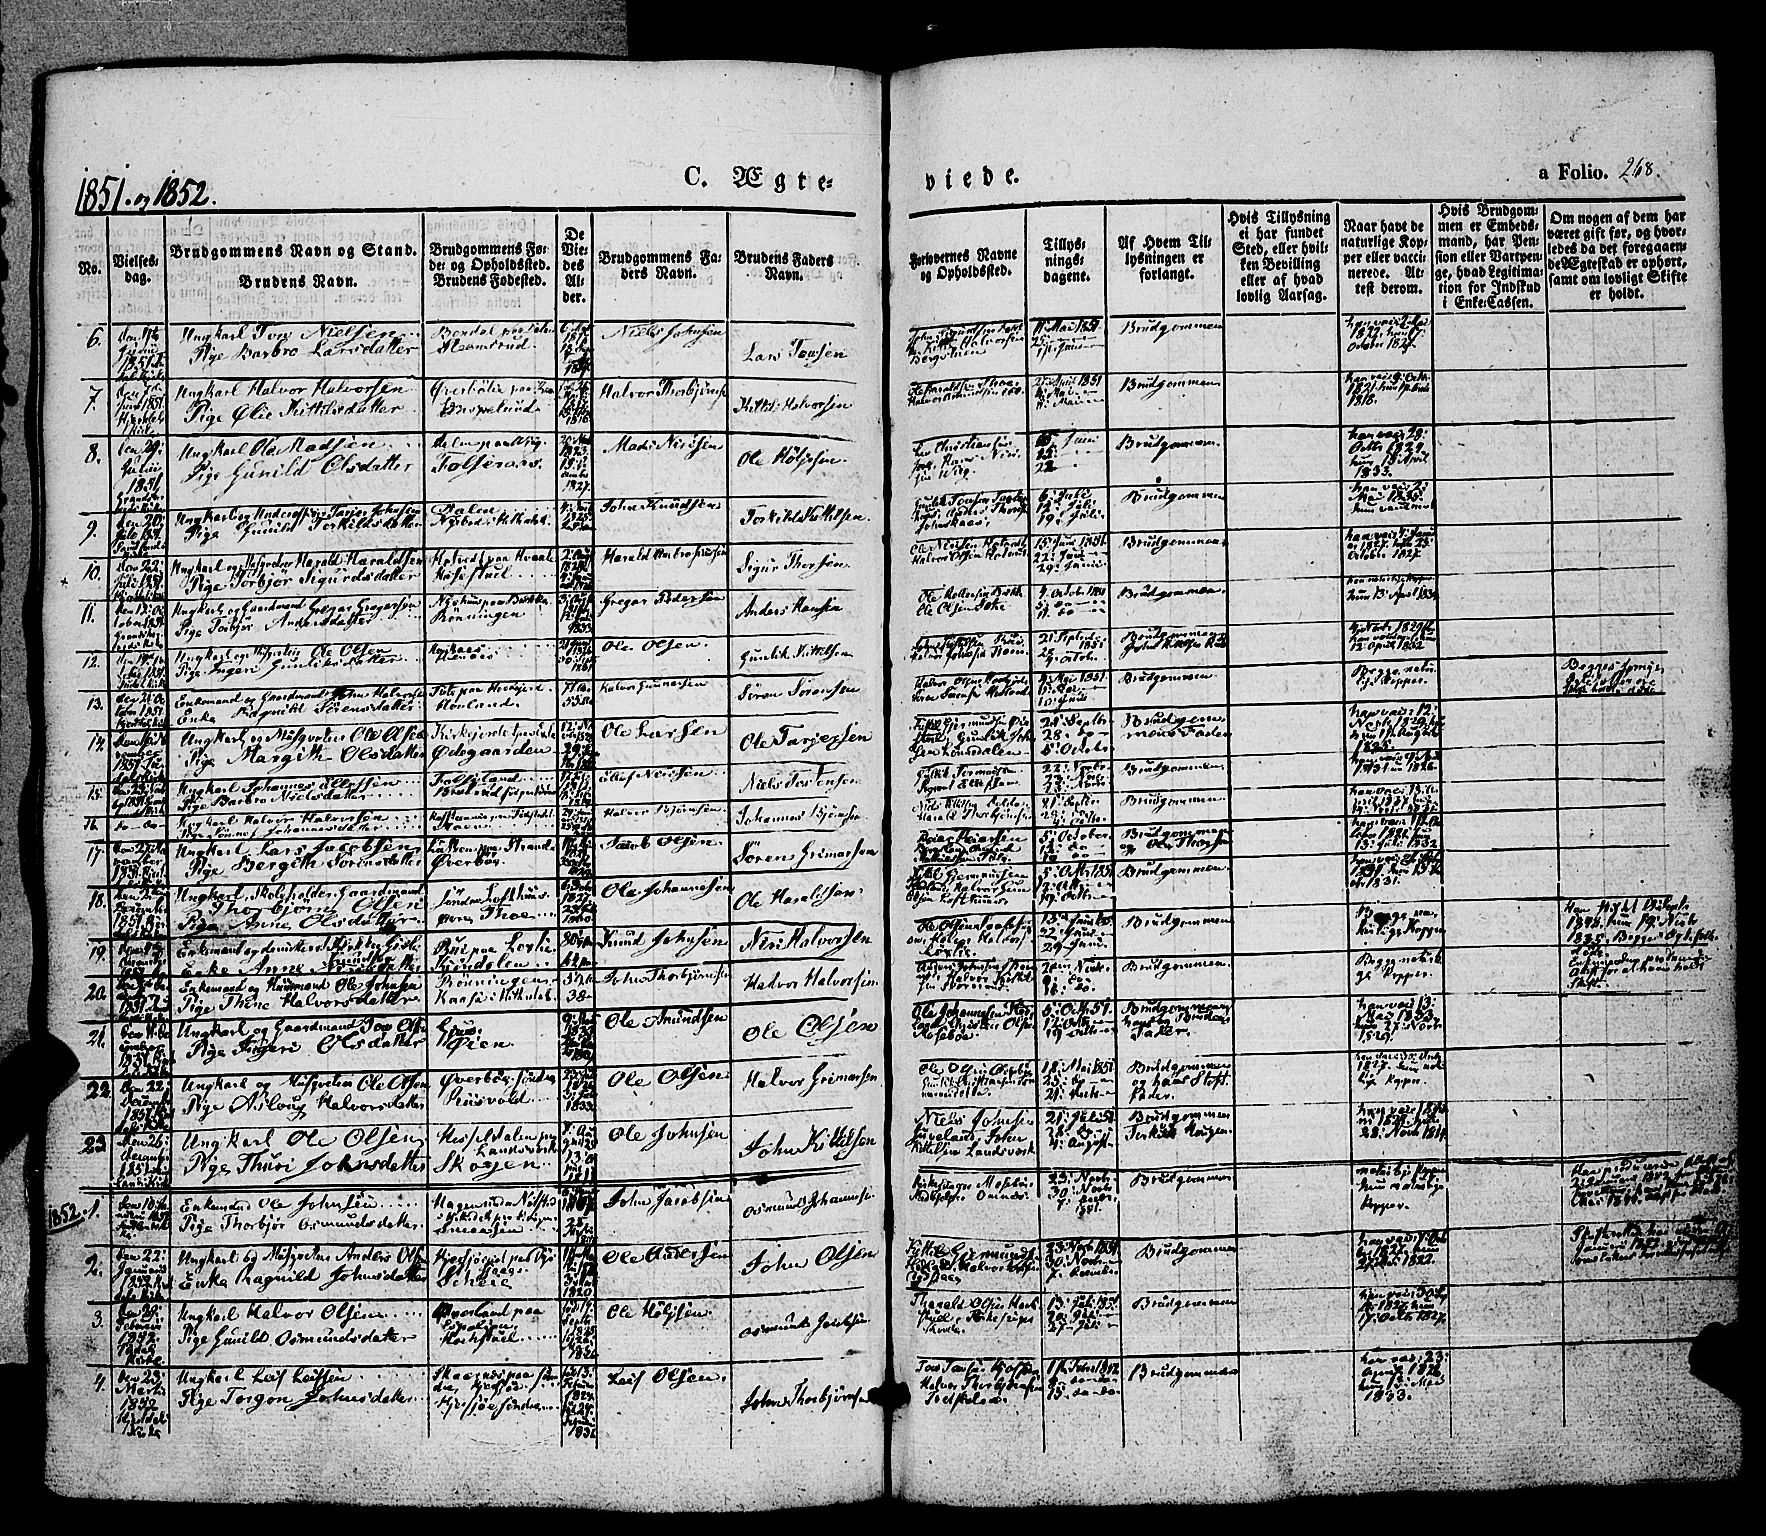 SAKO, Hjartdal kirkebøker, F/Fa/L0008: Ministerialbok nr. I 8, 1844-1859, s. 268